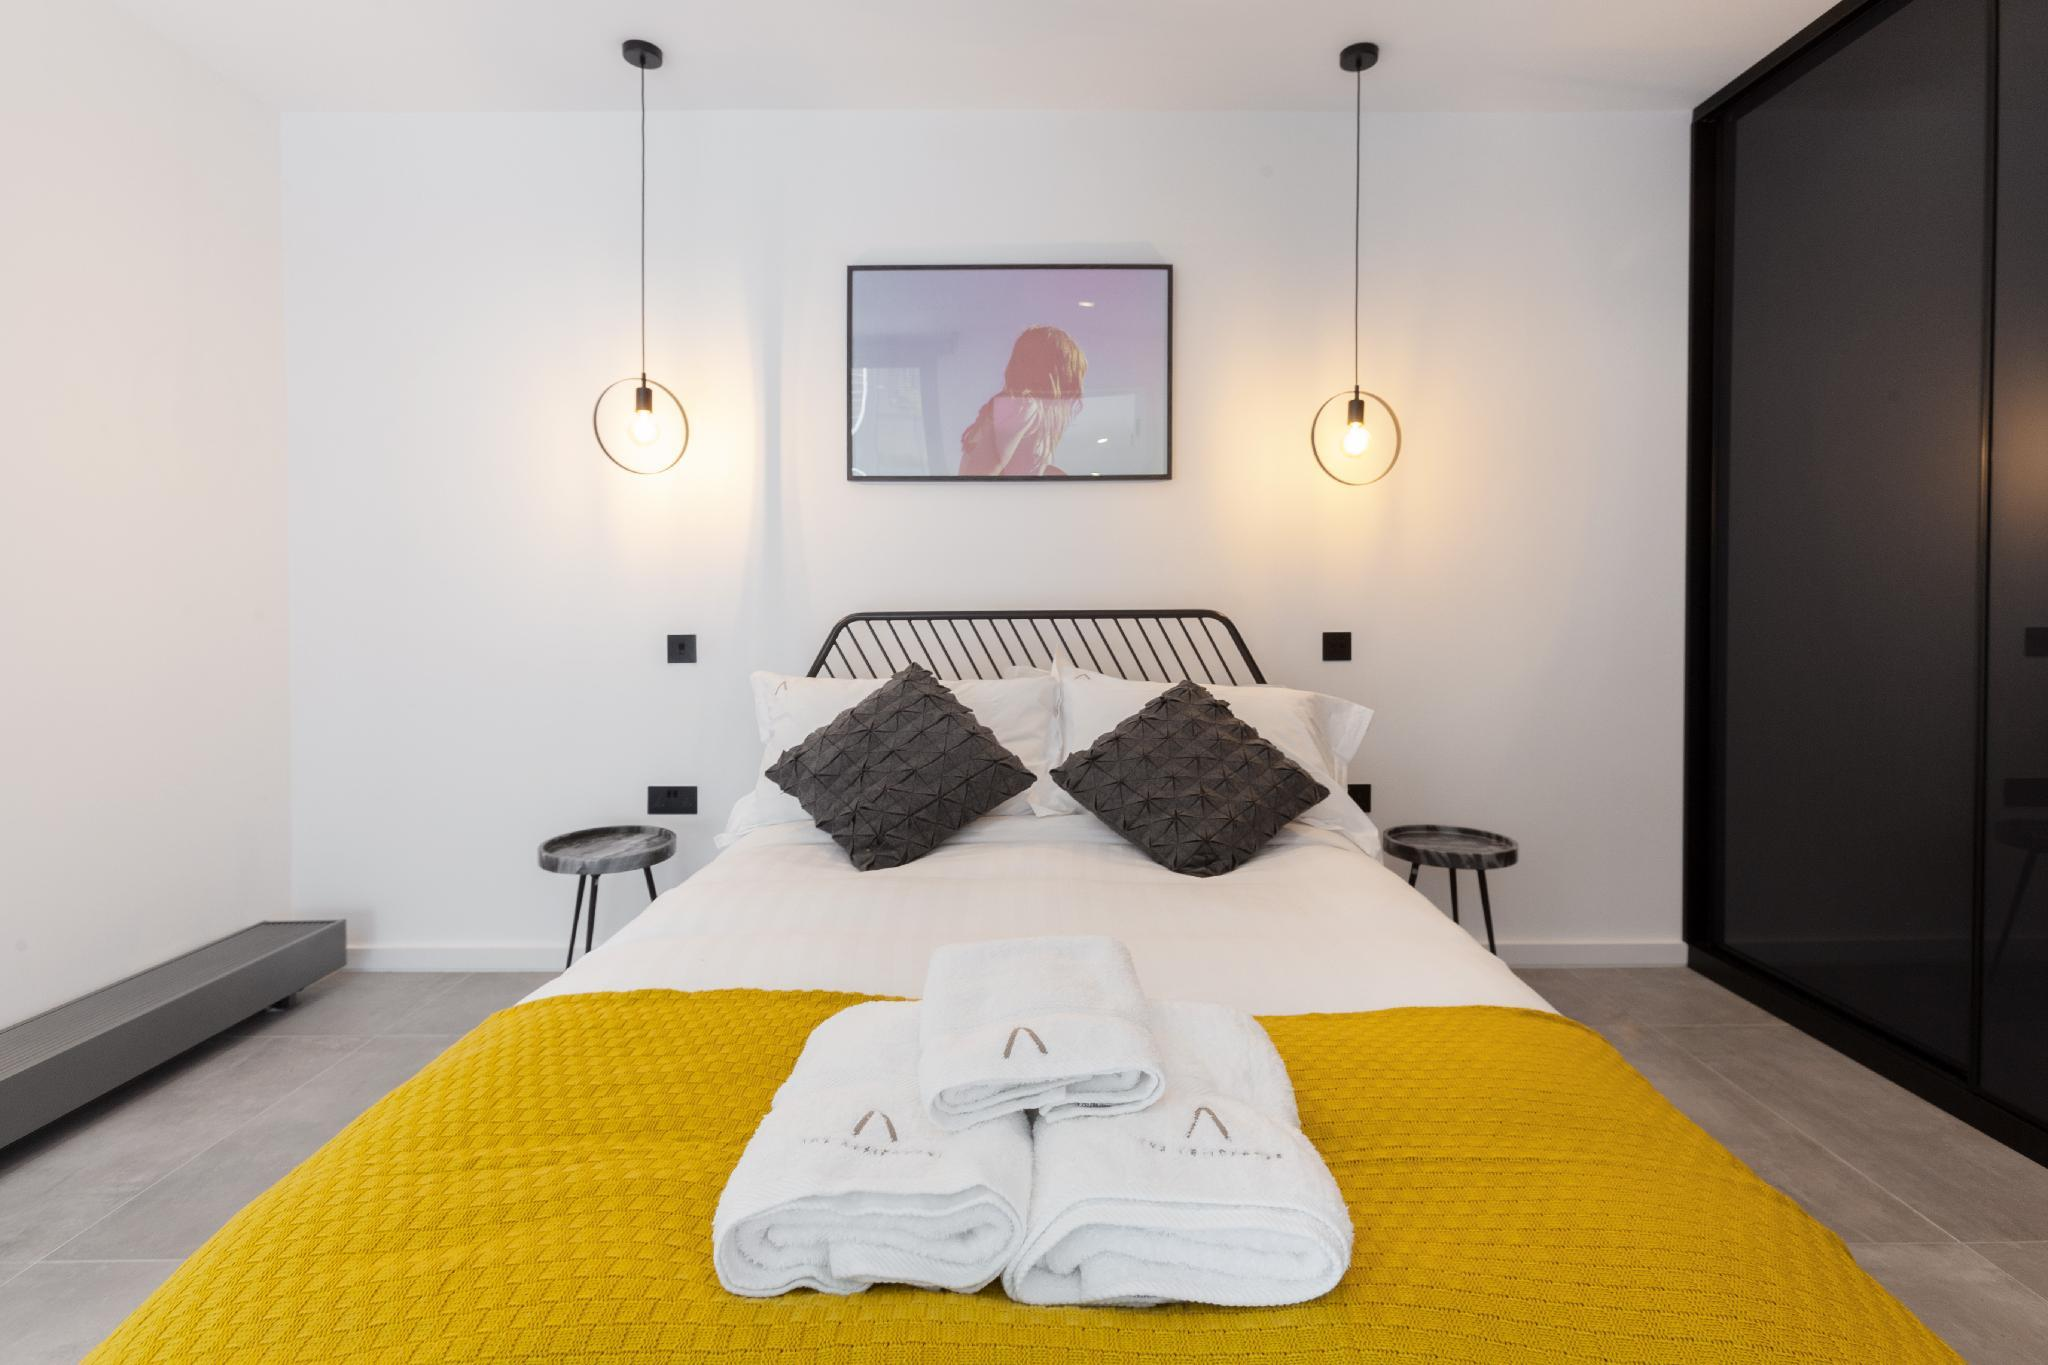 Stylish 3 bedroom House + Patio near Edgware Road